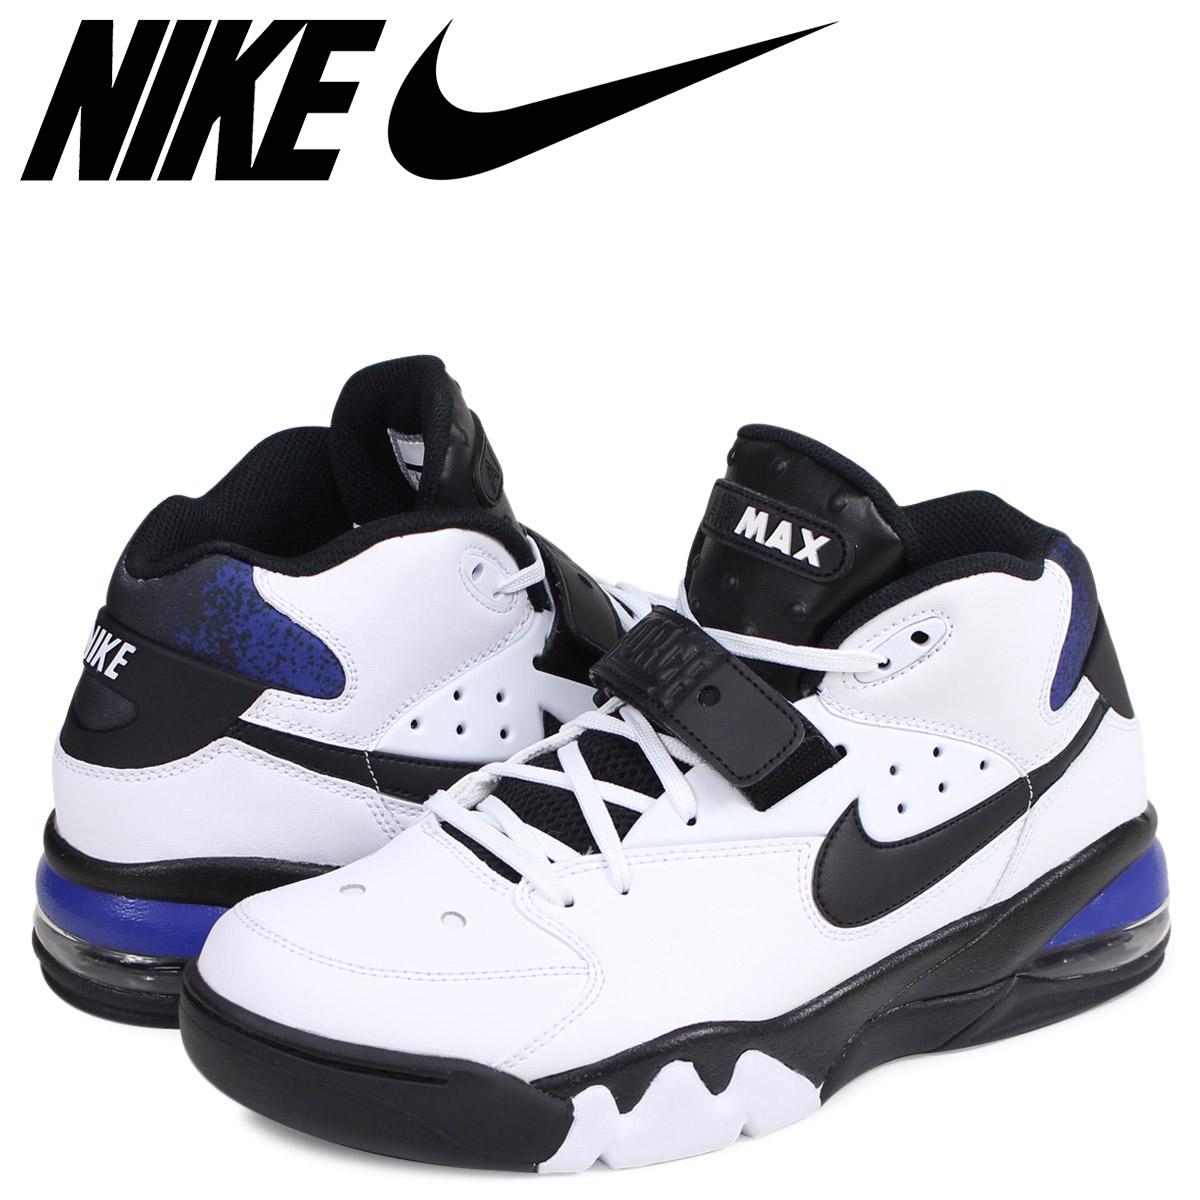 Nike NIKE air force max sneakers AIR FORCE MAX 93 CHARLES BARKLEY AH5534 100 men white